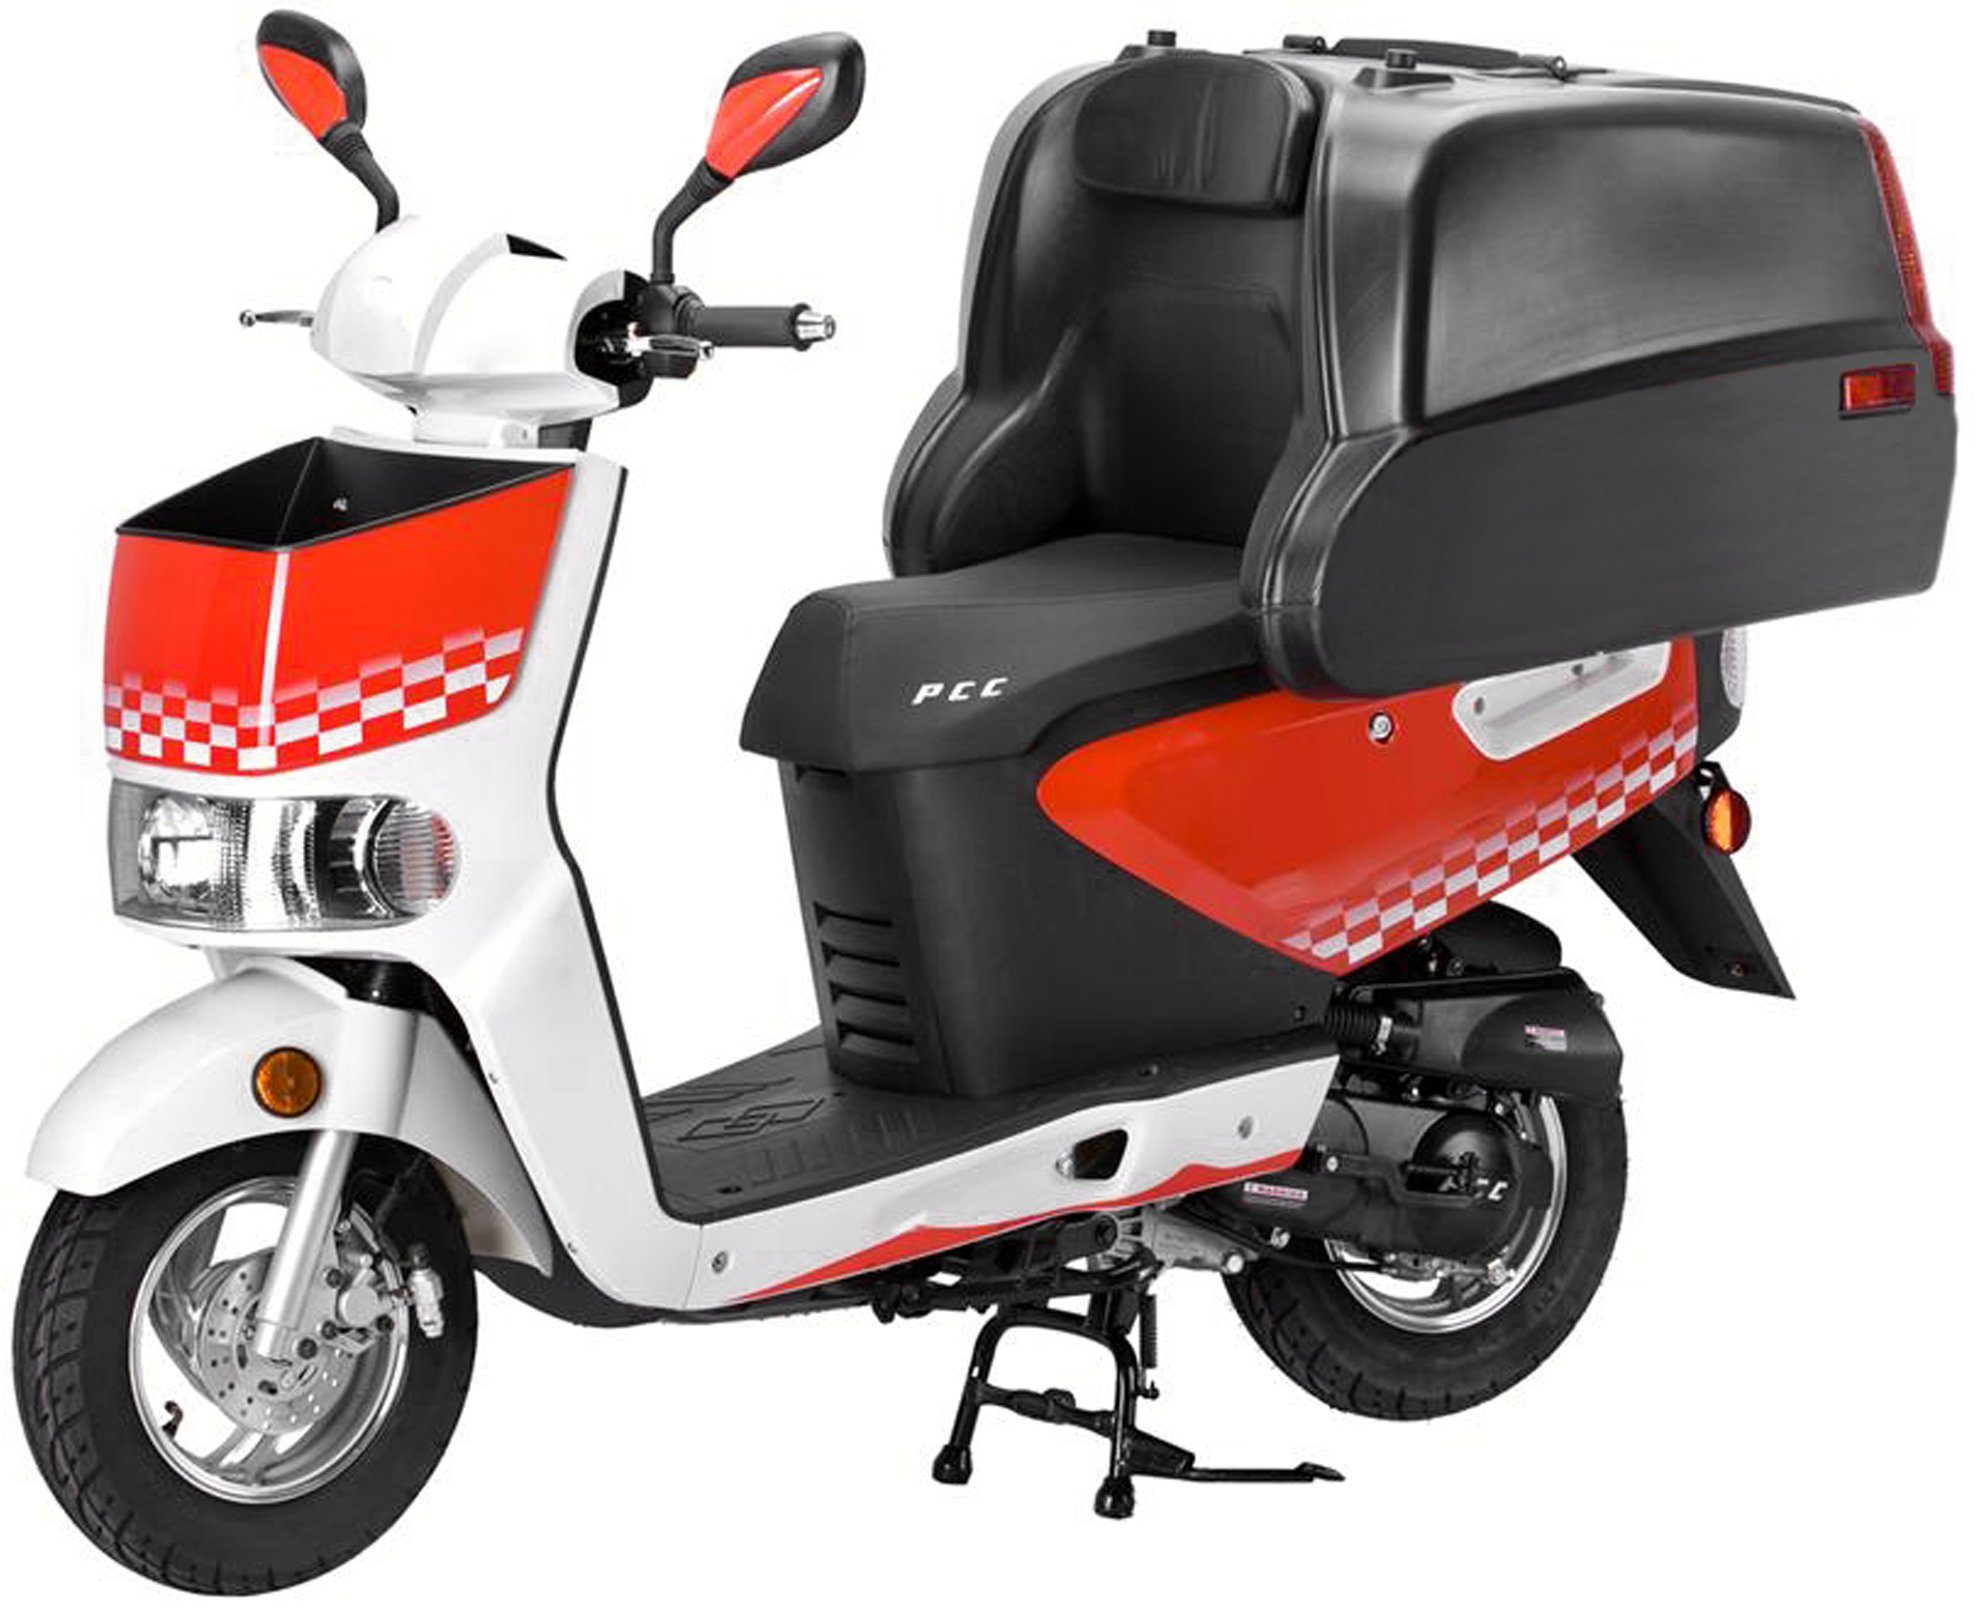 Luxxon Motorroller »Kangaroo«, 50 ccm, 45 km/h, Euro 2, ohne Transportbox, 50 ccm, 45 km/h